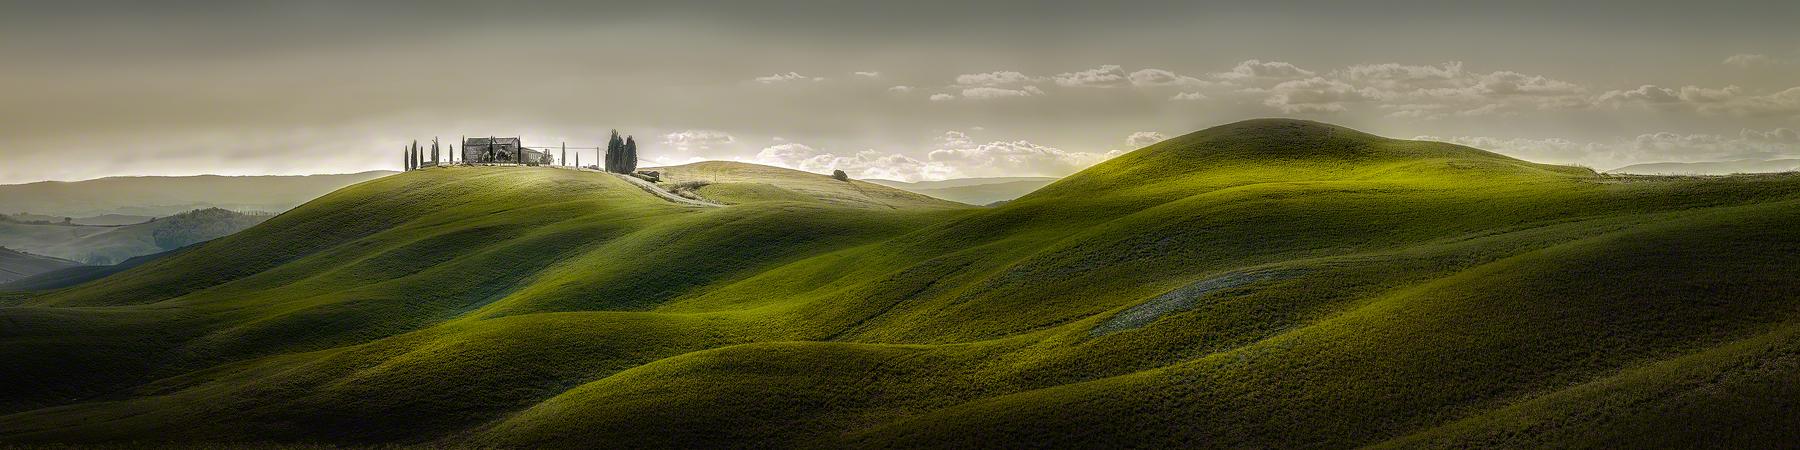 * Tuscany Hills *